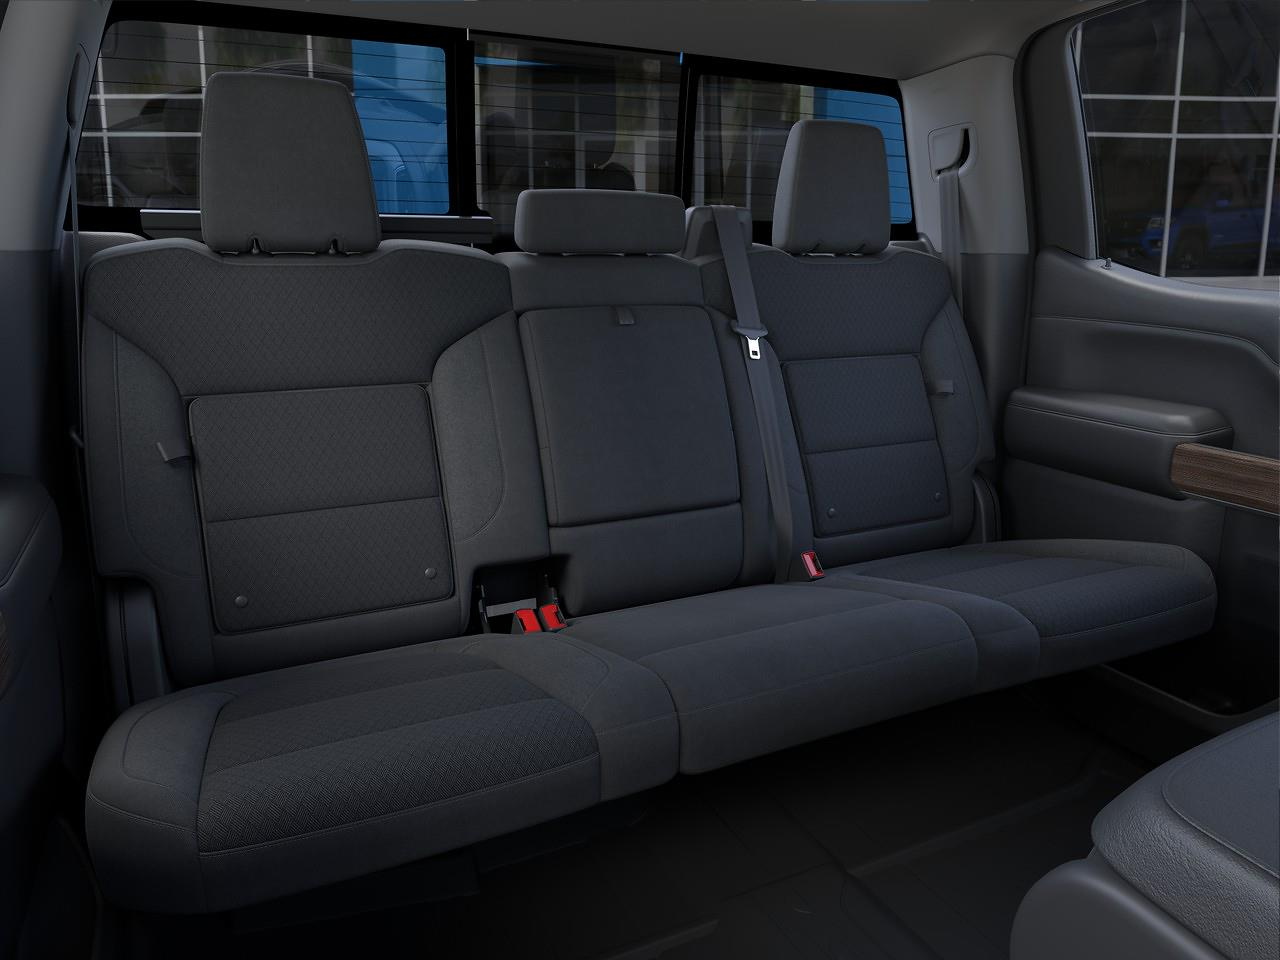 2021 Chevrolet Silverado 1500 Crew Cab 4x2, Pickup #186862 - photo 14